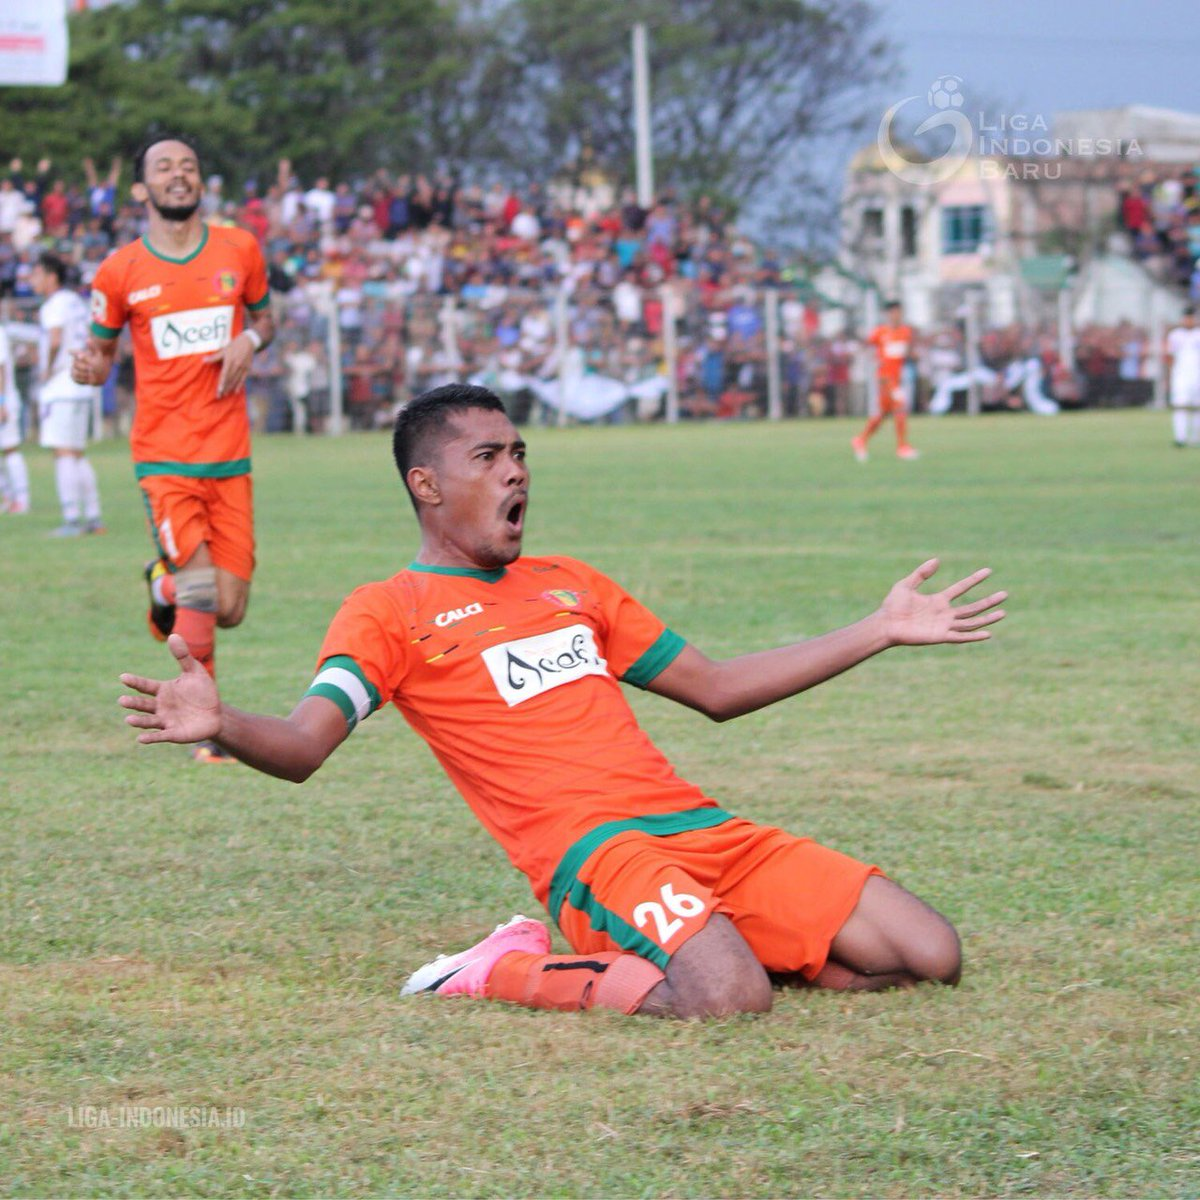 RT @Liga2Match: Ekspresi dari Fary Komul setelah mencetak satu gol ke gawang Persita Tangerang ⚽️✔️  #Liga2Indonesia https://t.co/hoiHpjduul